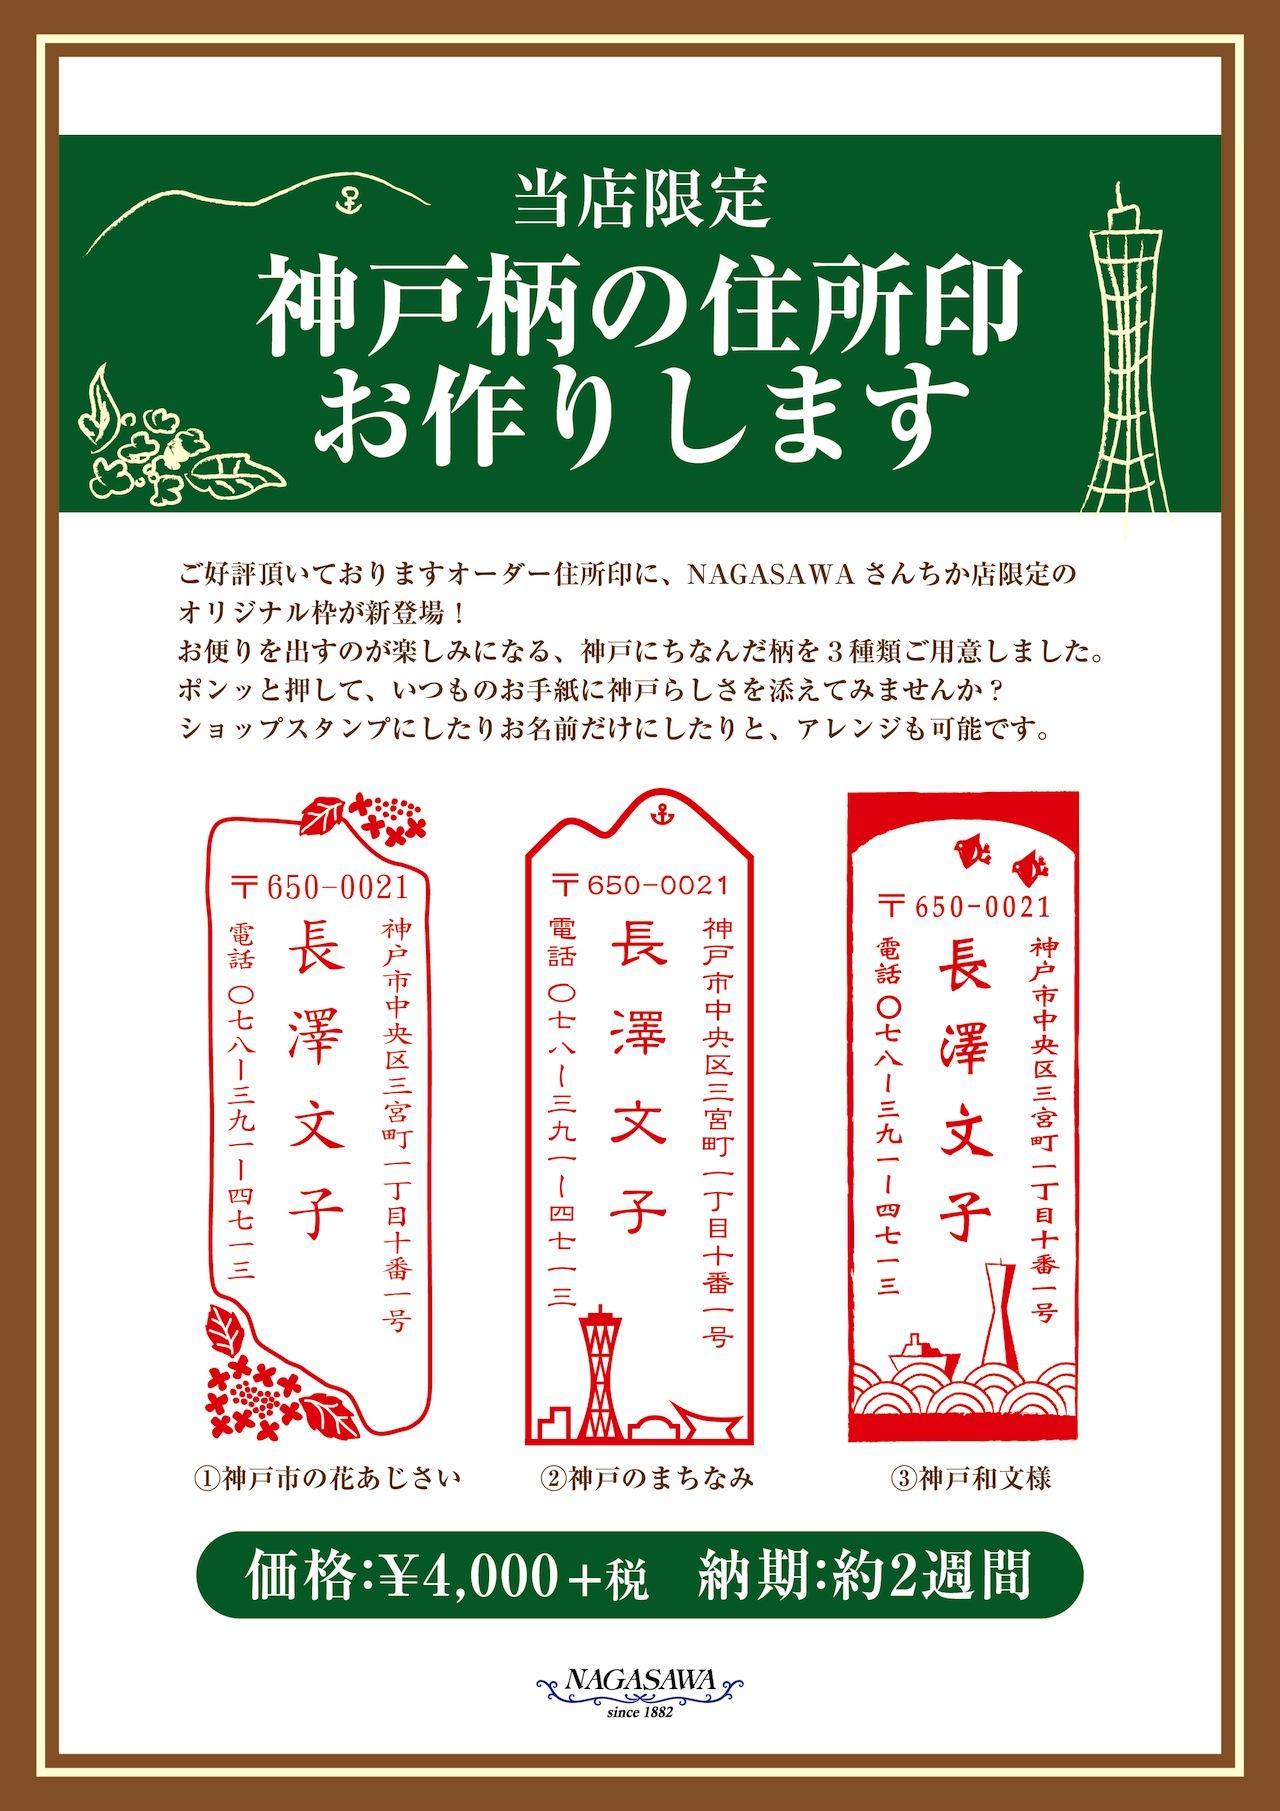 神戸柄の住所印